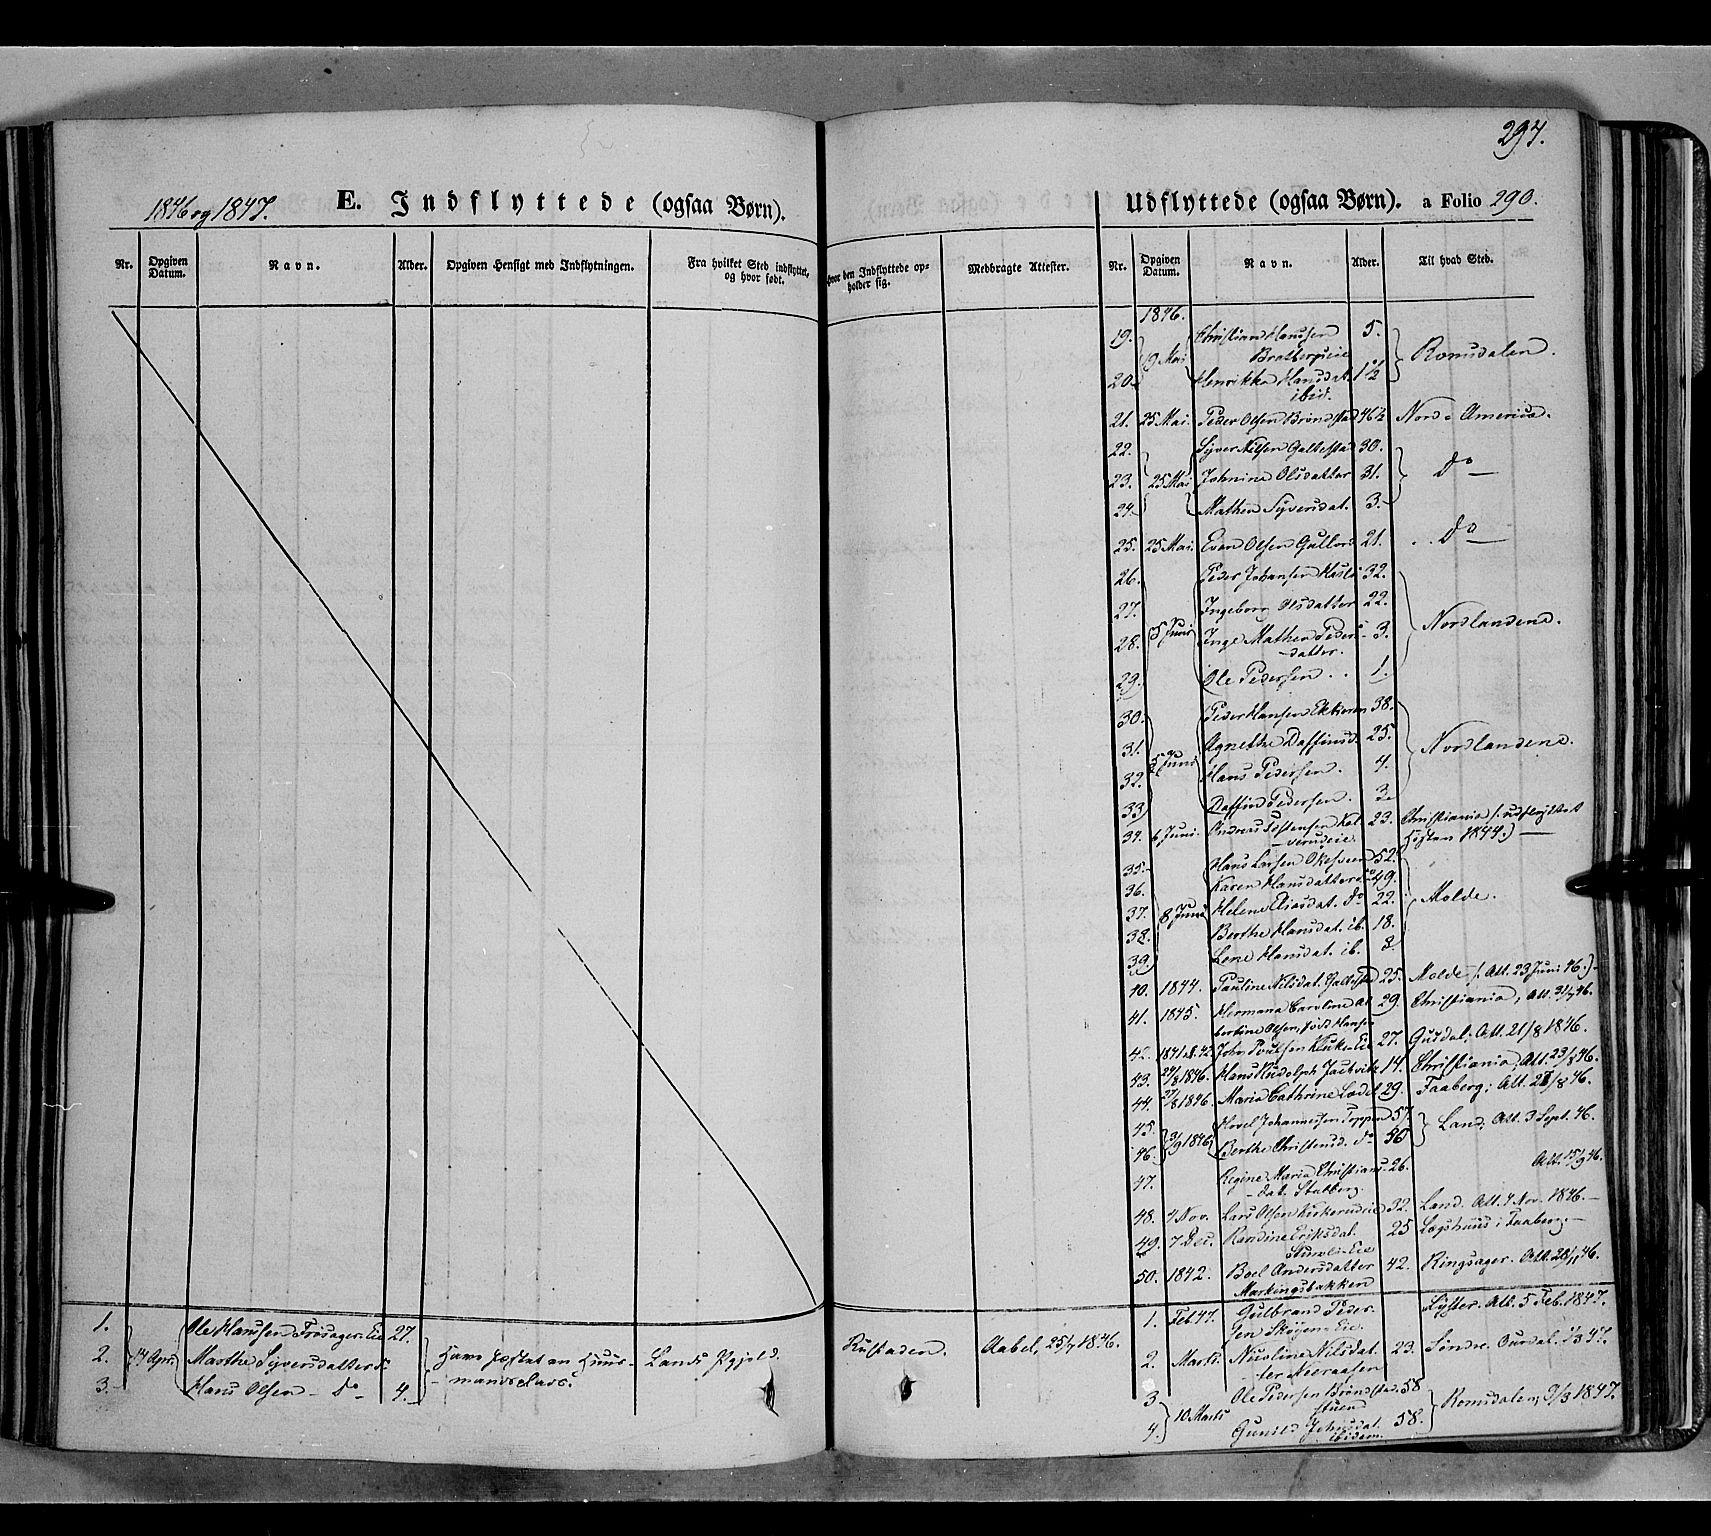 SAH, Biri prestekontor, Ministerialbok nr. 5, 1843-1854, s. 294